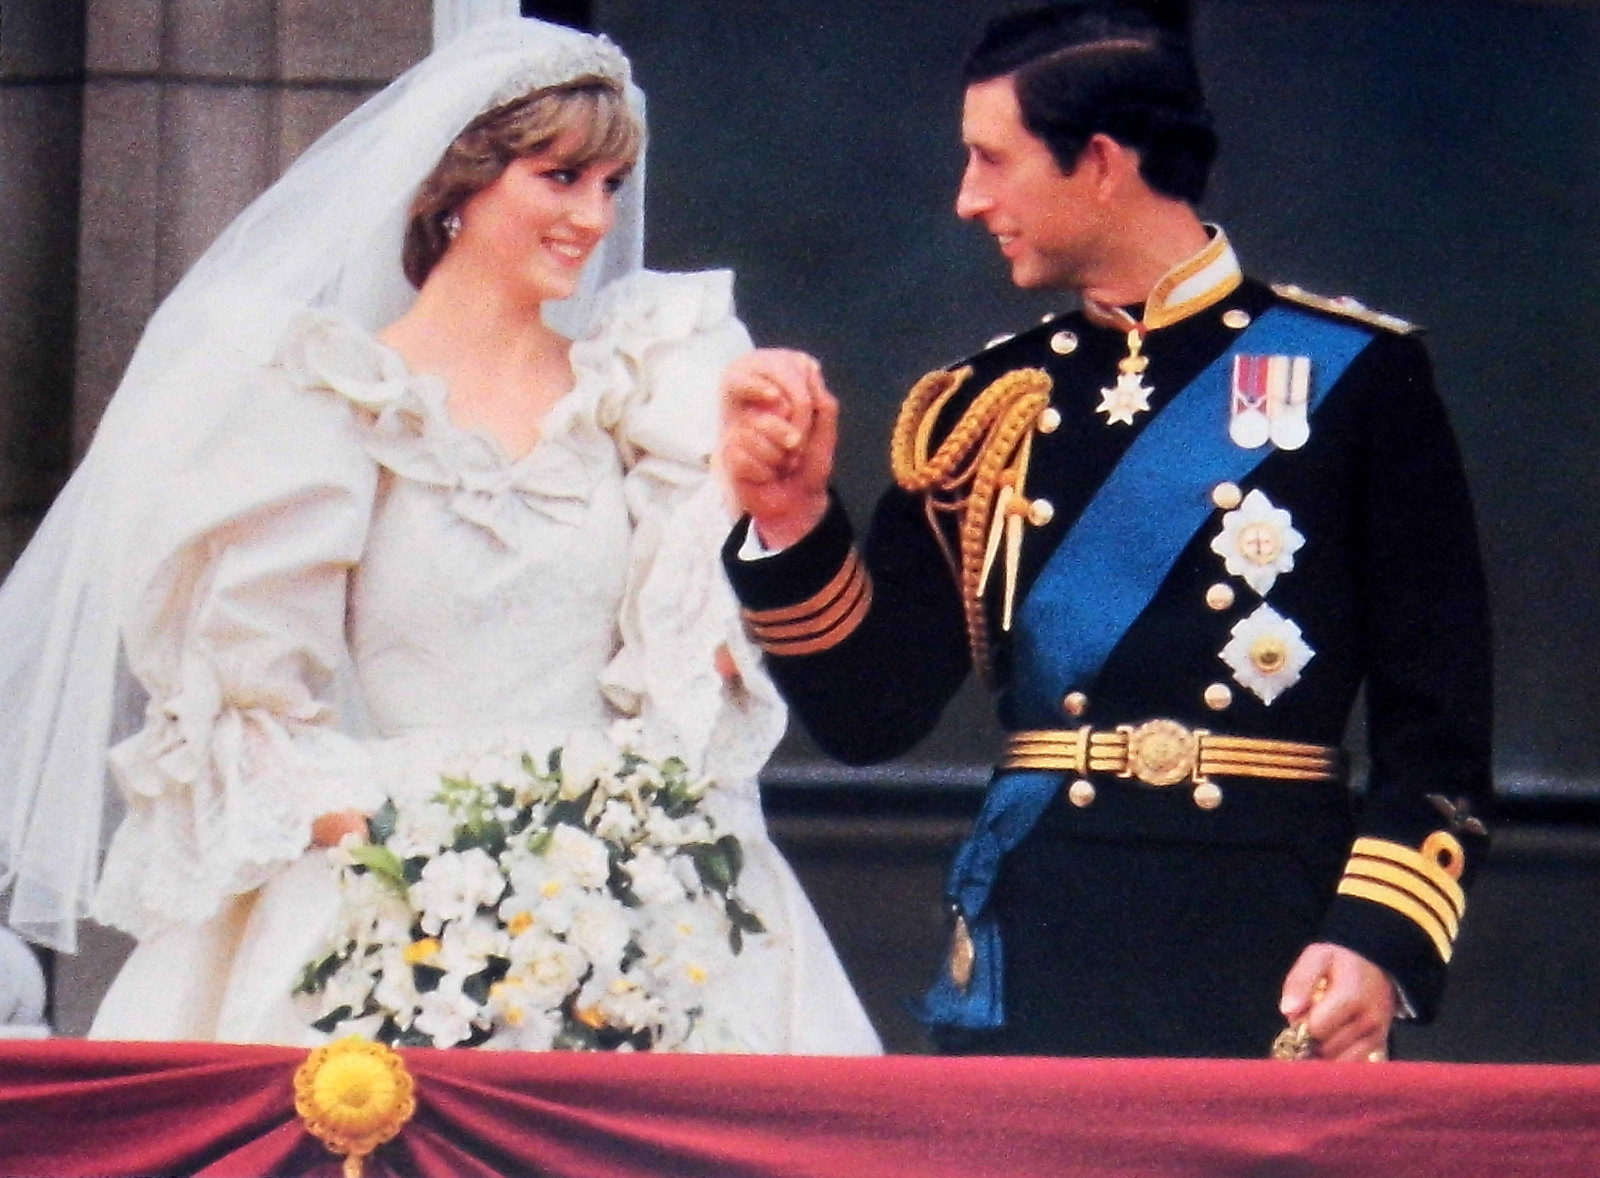 The Wedding of Princess Diana and Prince Charles, Photograph at Buckingham Palace, July 29, 1981